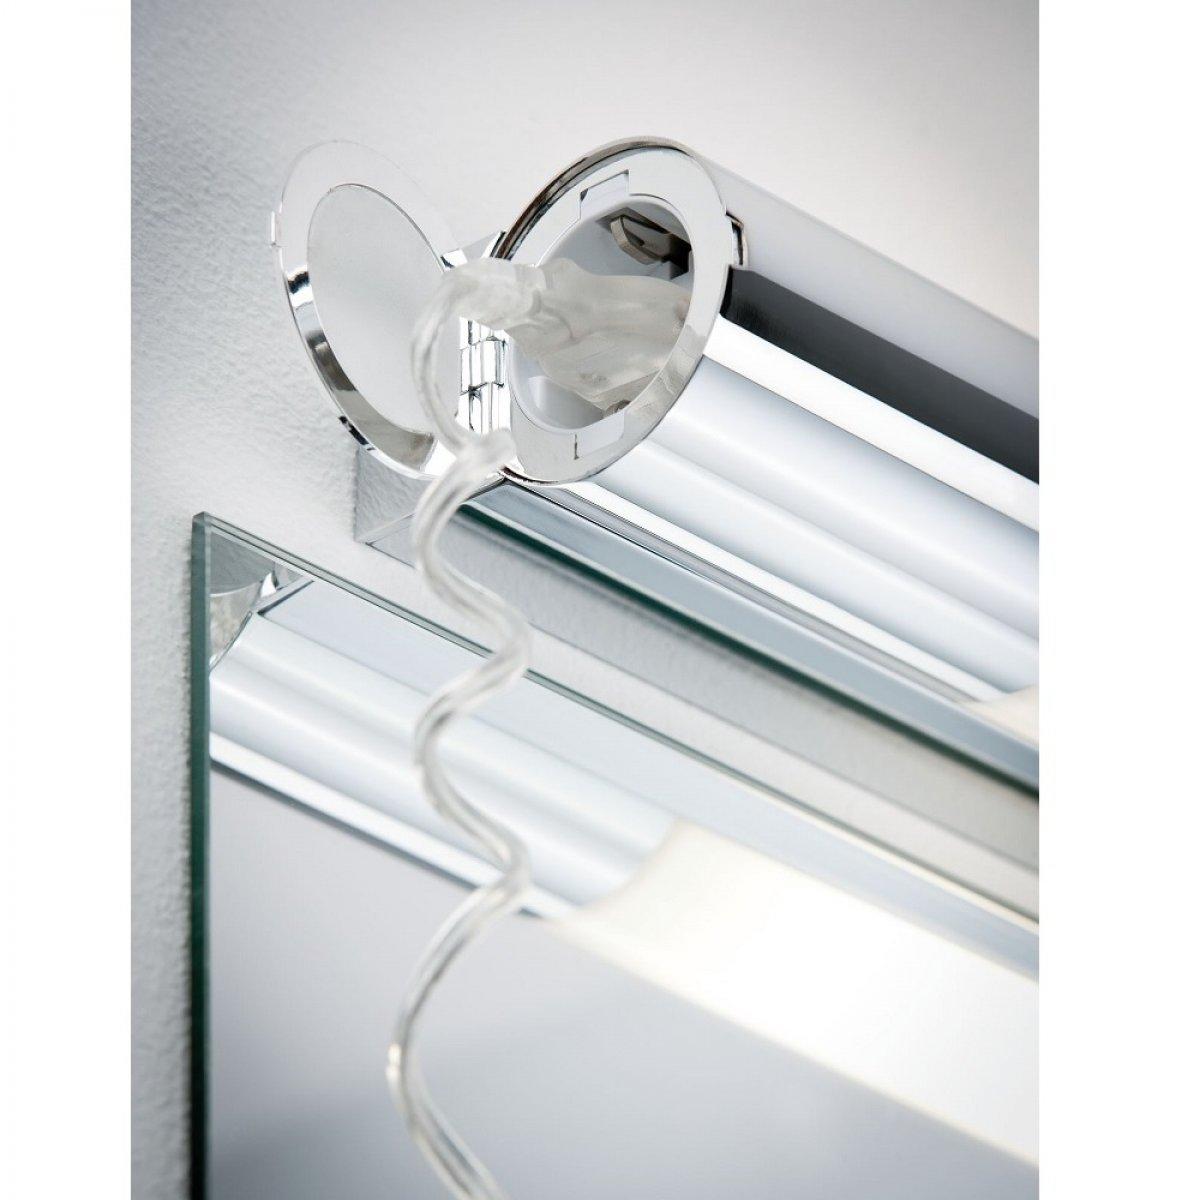 Paulmann No. 79713 Spiegelleuchte LED Orgon IP44 Steckdose 10,5W Chrom 70 cm